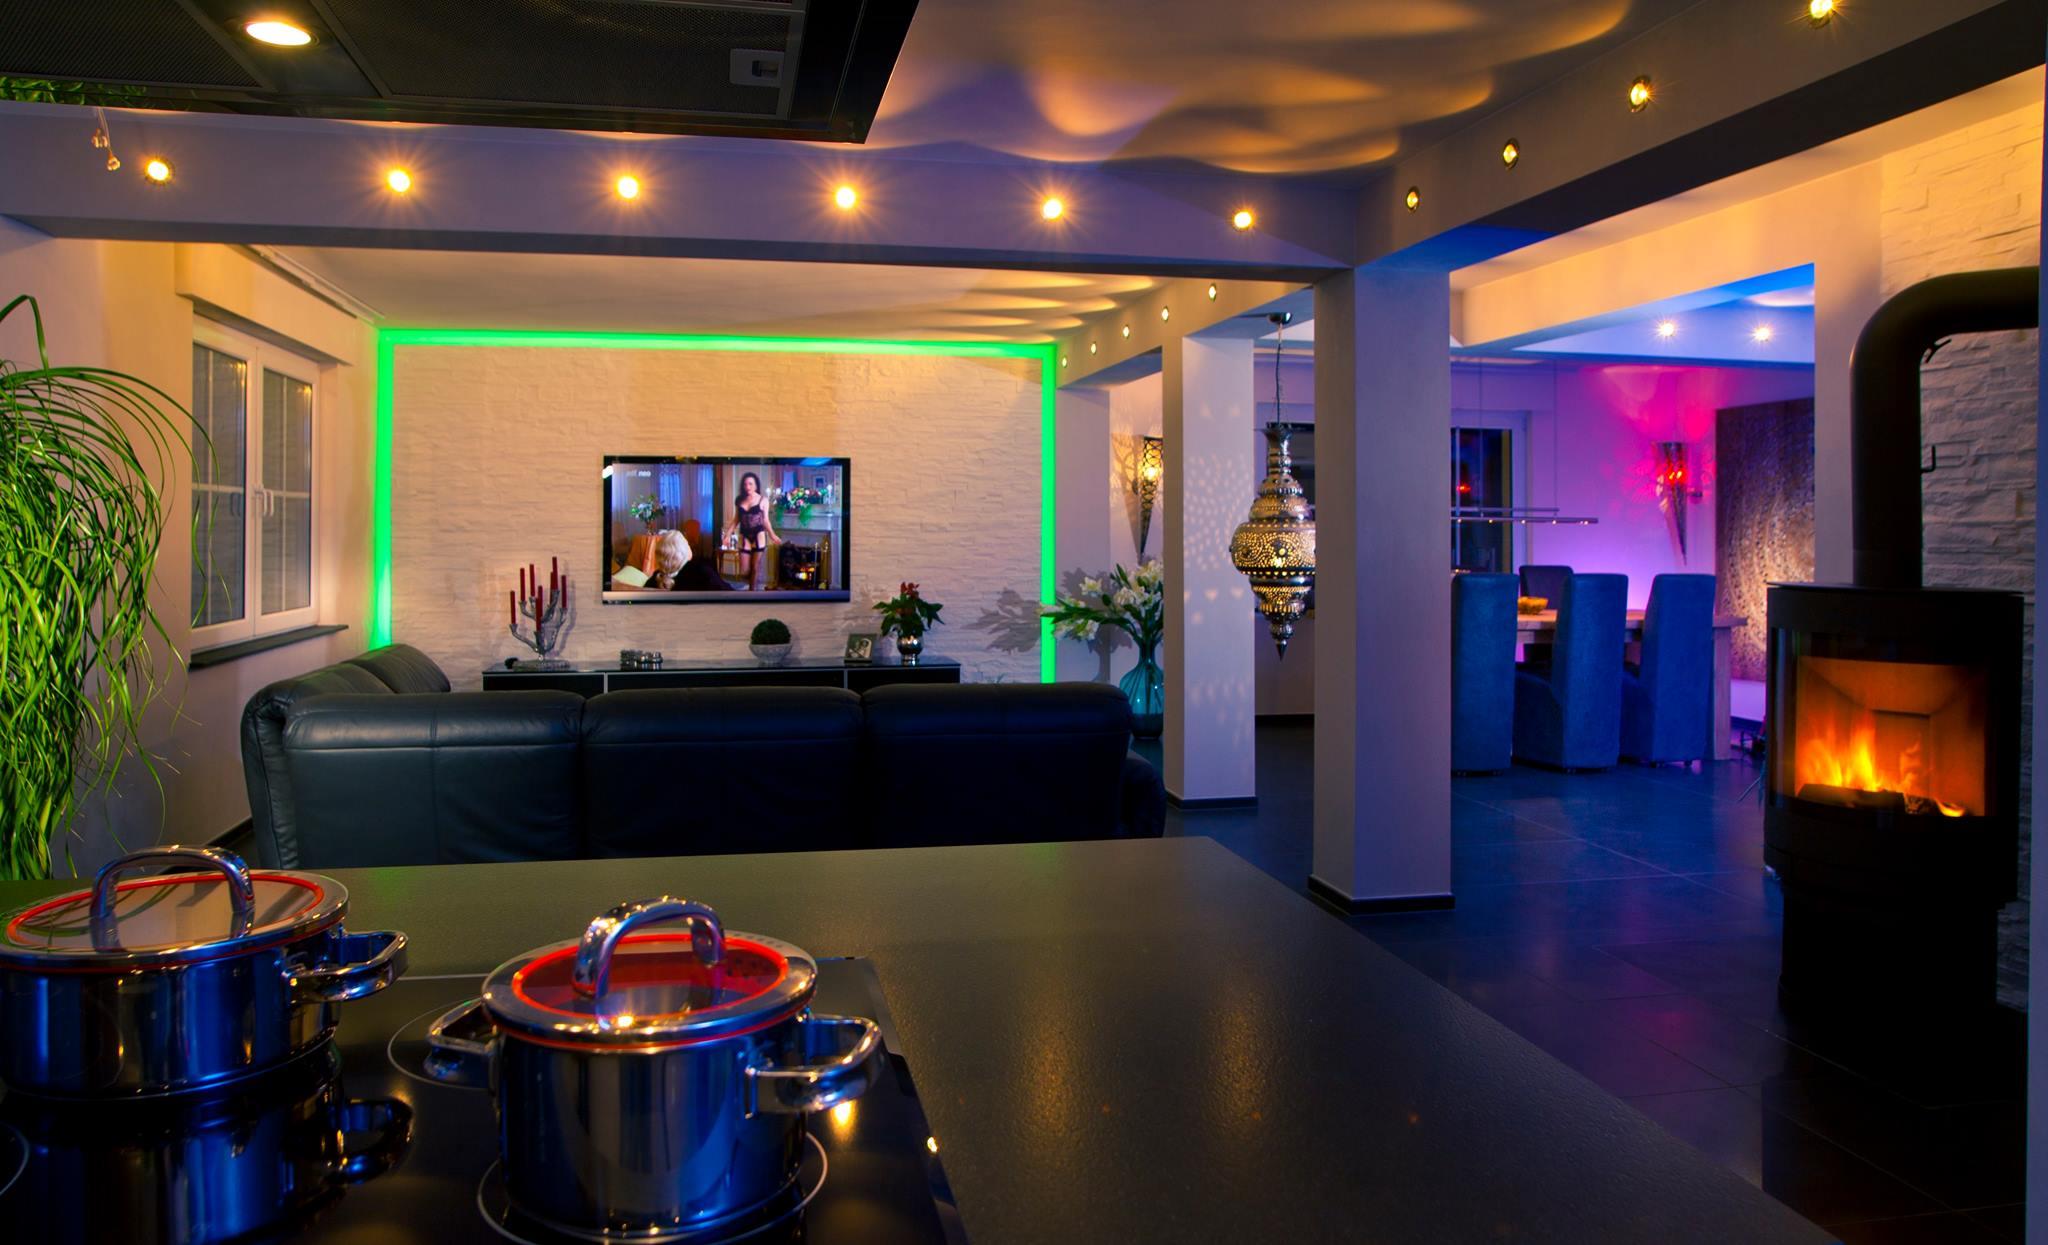 My Home Ist My Castle Interieur Design By Torsten Mueller Bad Honnef